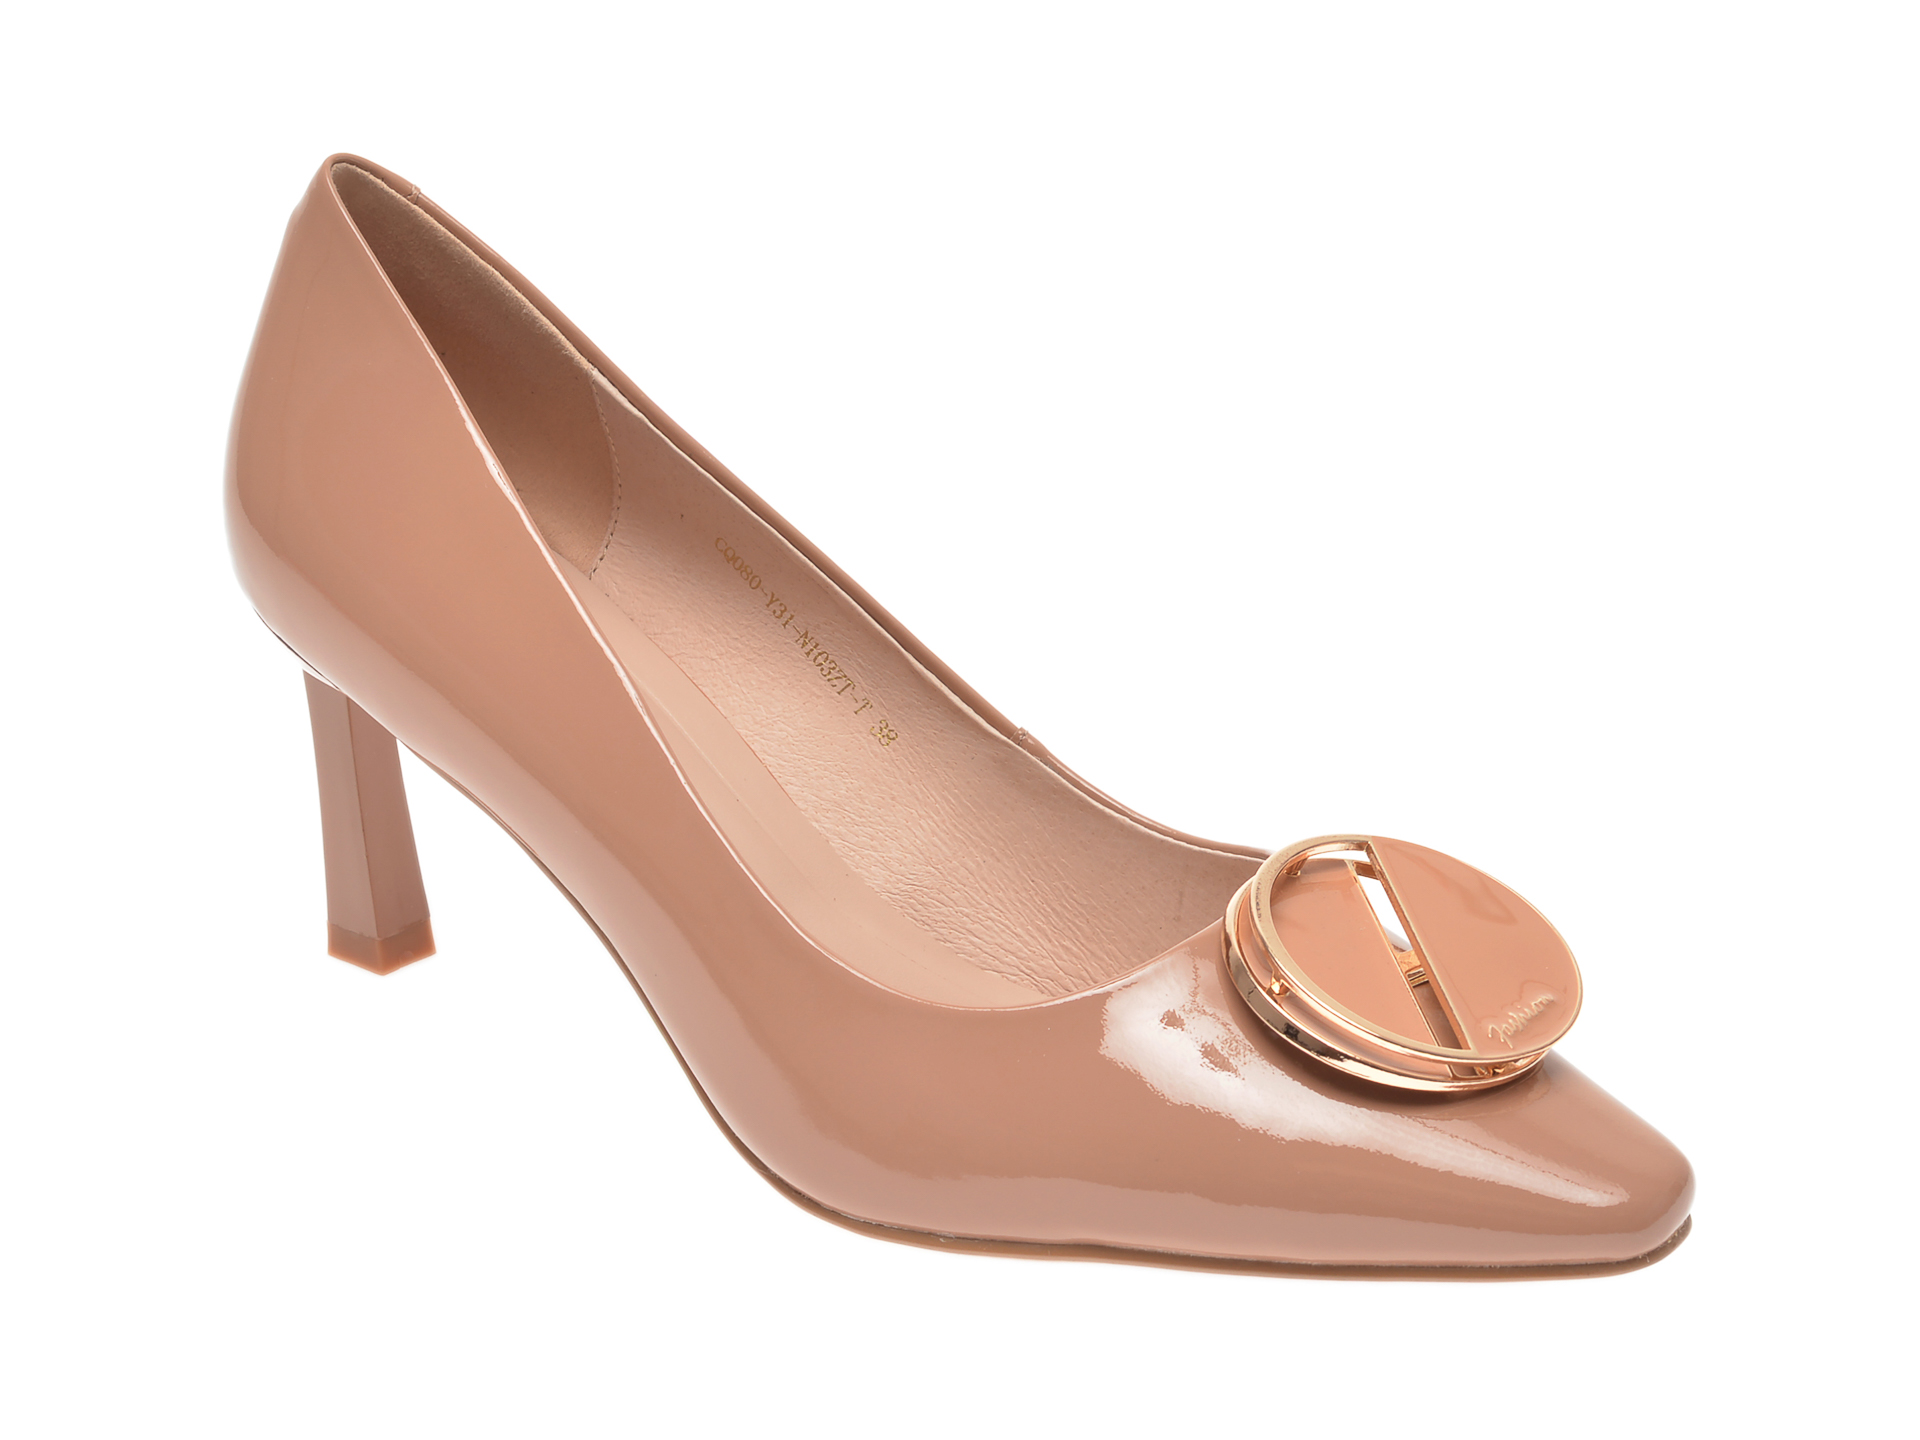 Pantofi EPICA bej, CQ080Y3, din piele naturala lacuita